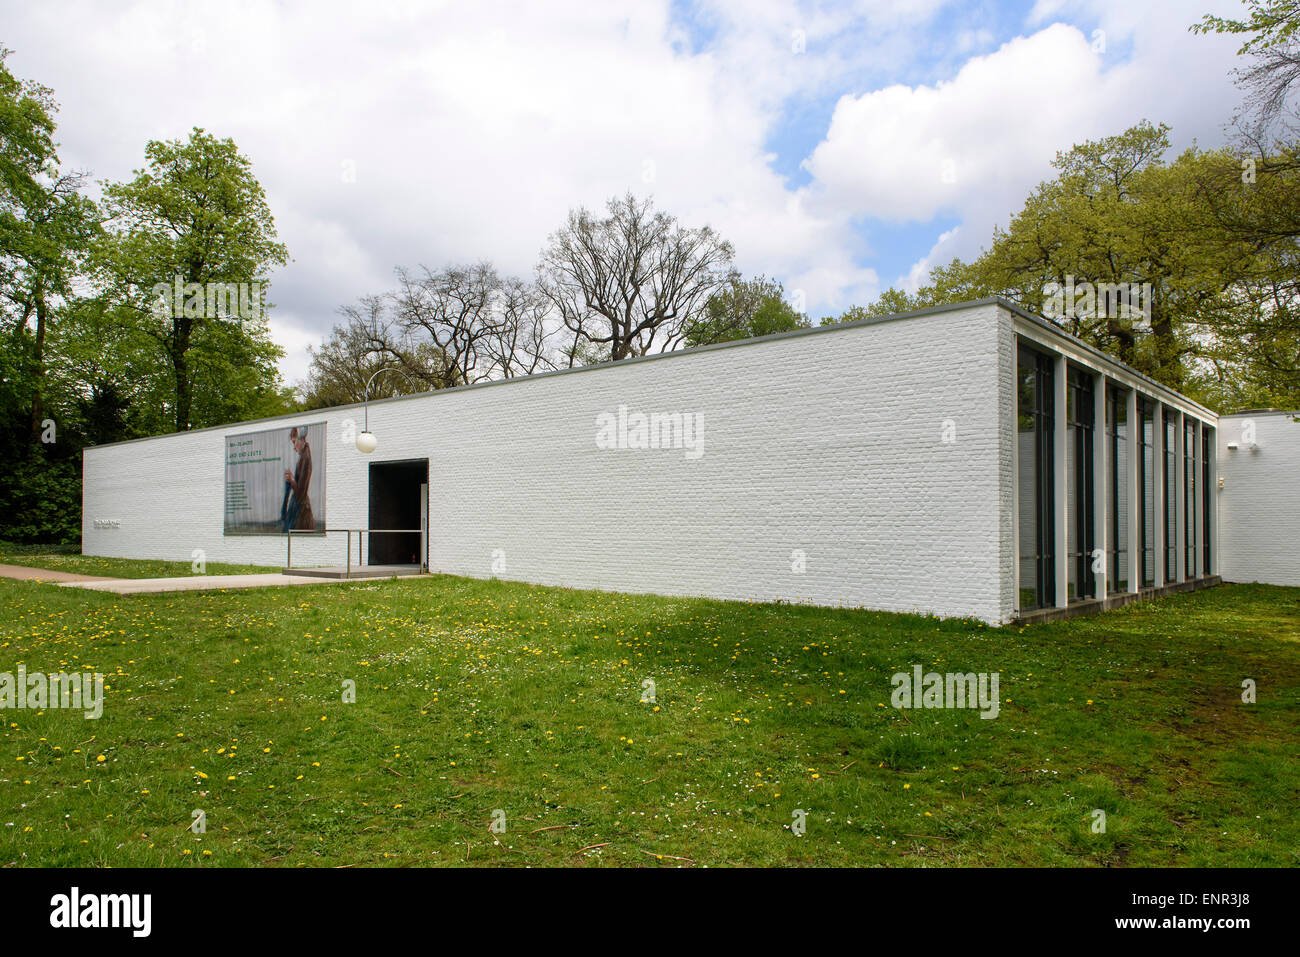 Ernst Barlach House in the Jenischpark, built 1962 by Werner Kallmorgen, Hamburg, Germany Stock Photo